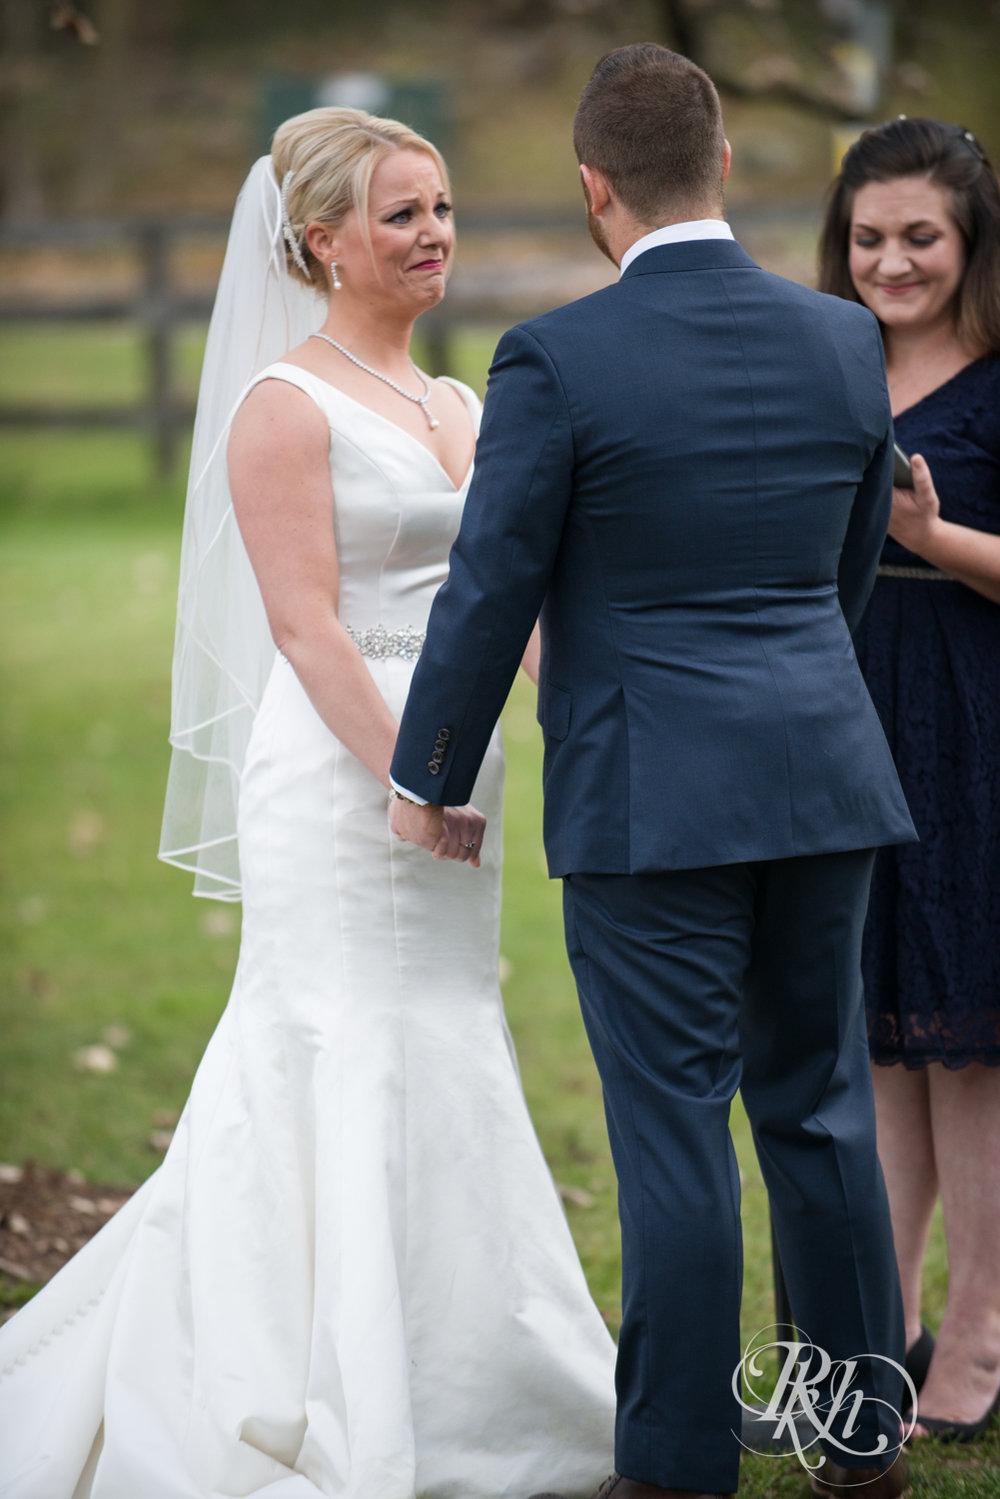 Amanda & Luke - Minnesota Wedding Photography - Mayowood Stone Barn - Rochester - RKH Images - Blog (49 of 67).jpg